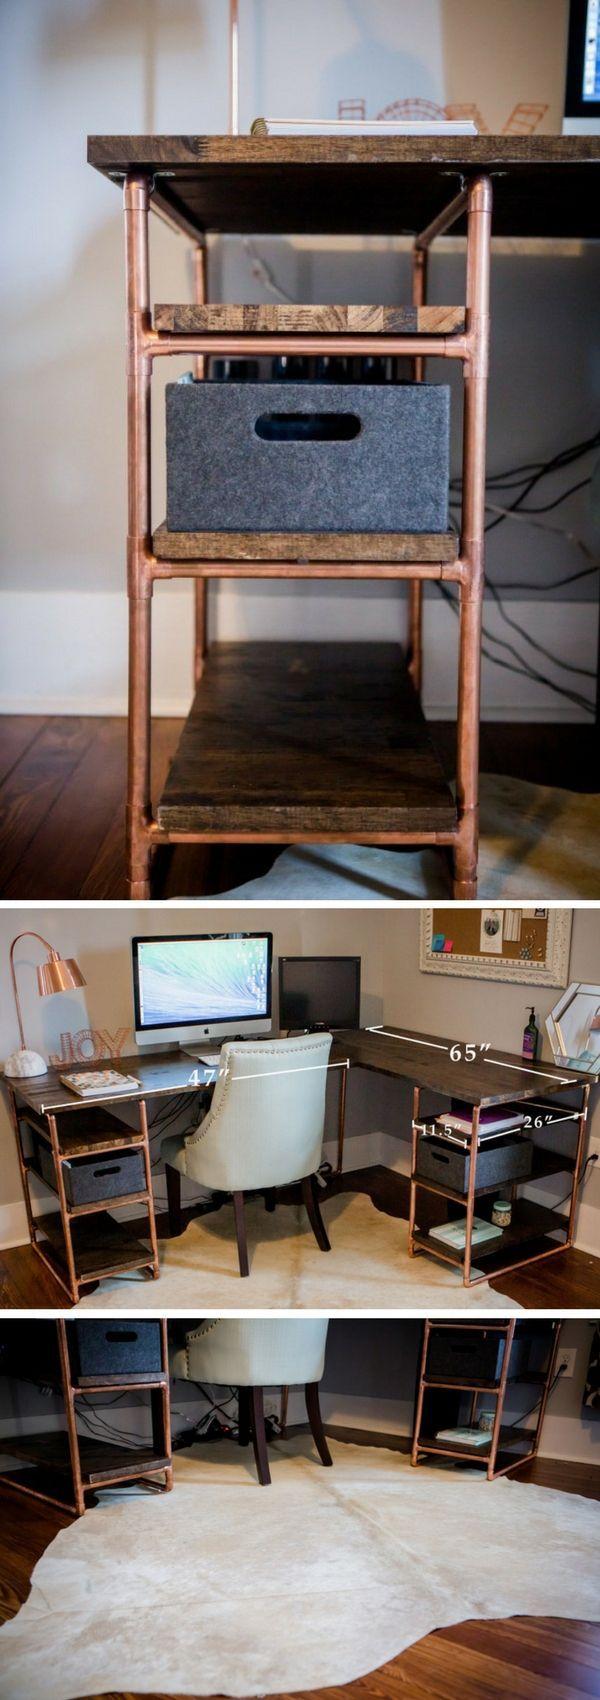 Best 25+ Corner office desk ideas on Pinterest | Rustic farmhouse ...